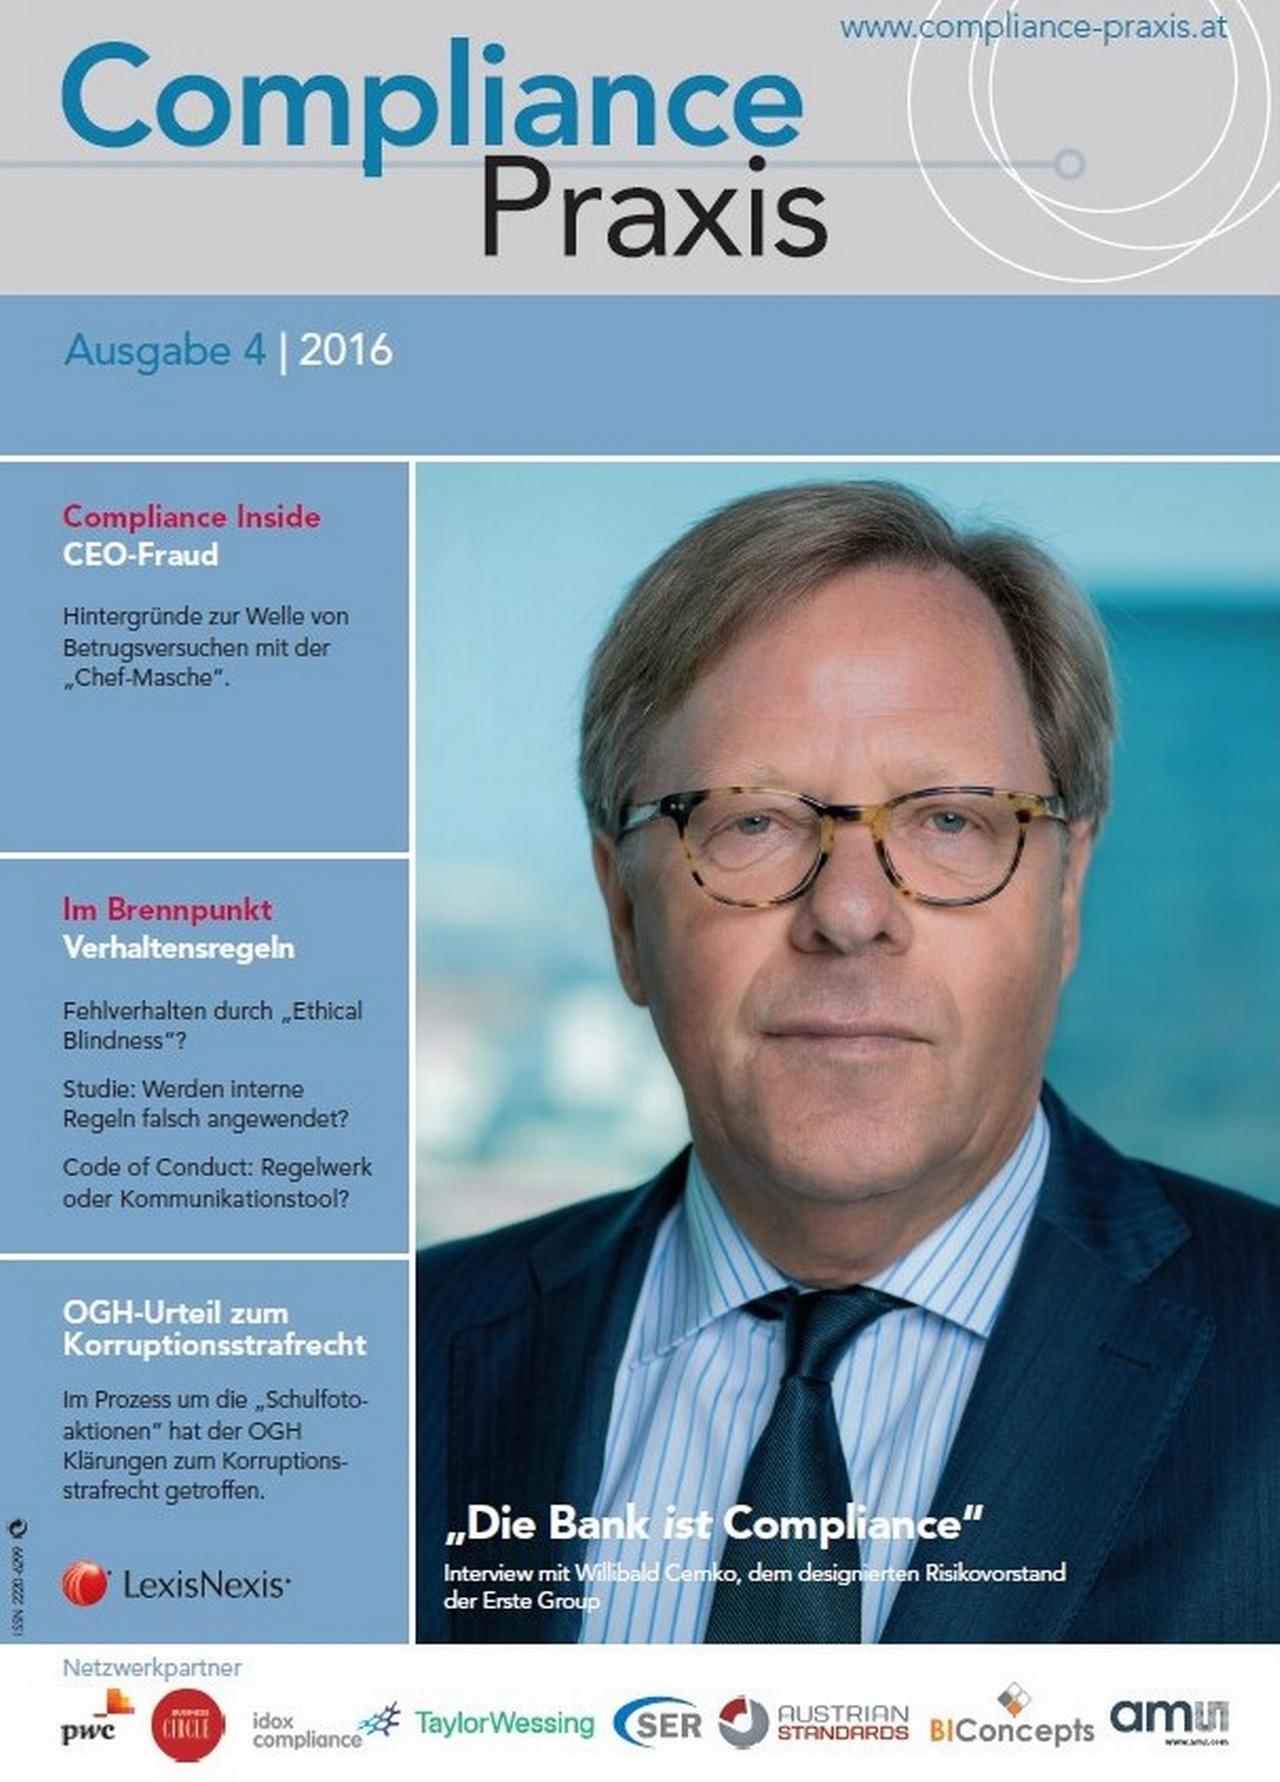 Cover von Compliance Praxis Ausgabe 4/2016, © LexisNexis